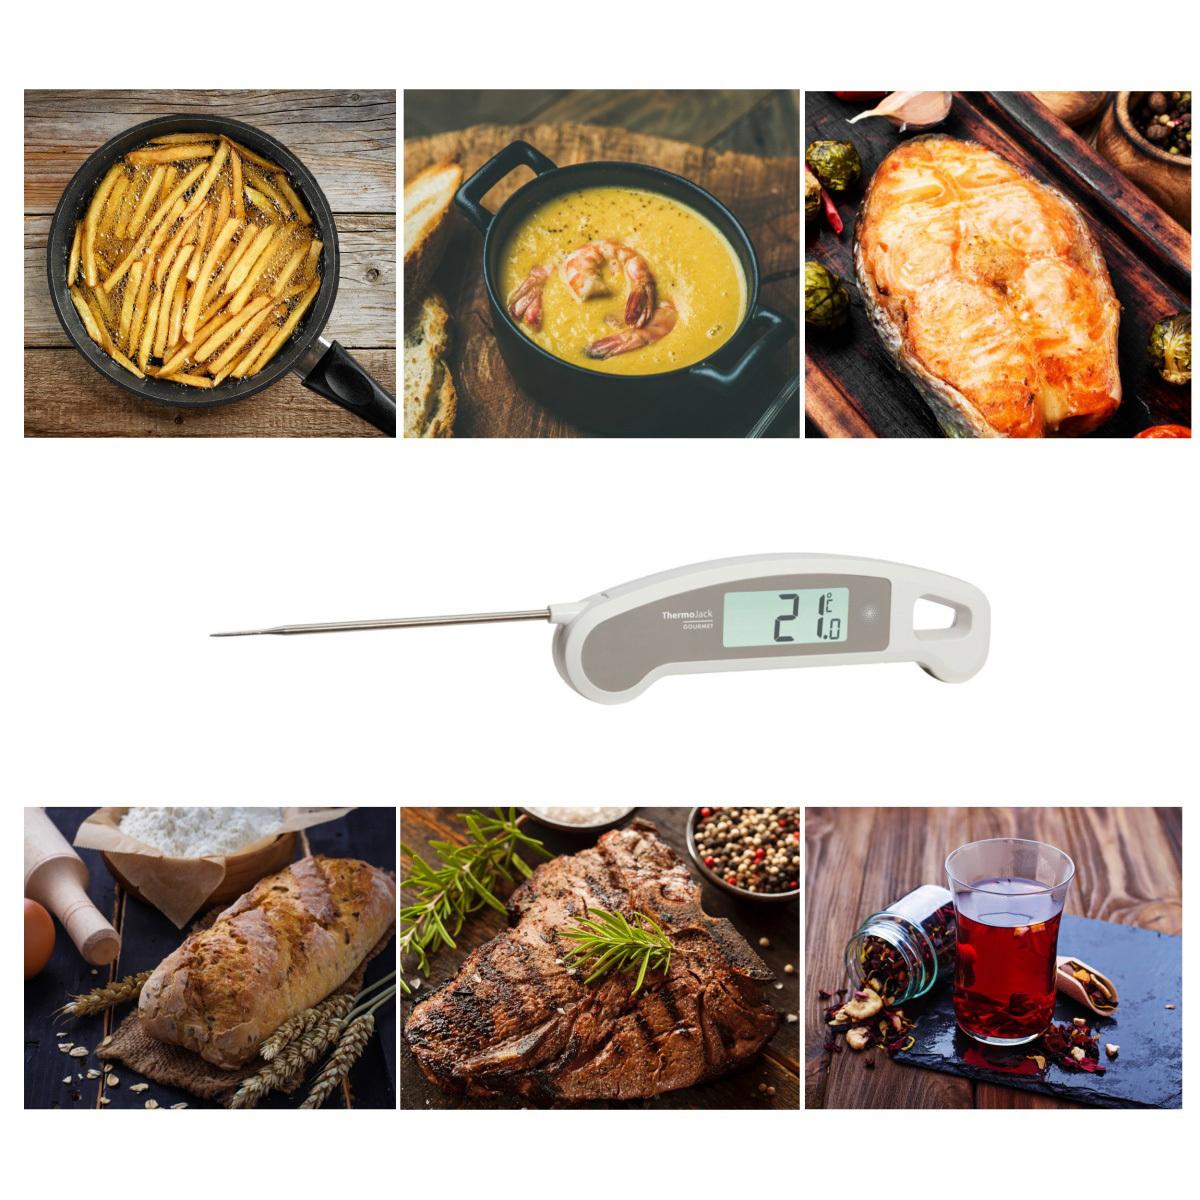 30-1060-02-profi-küchenthermometer-thermo-jack-gourmet-anwendung-1200x1200px.jpg